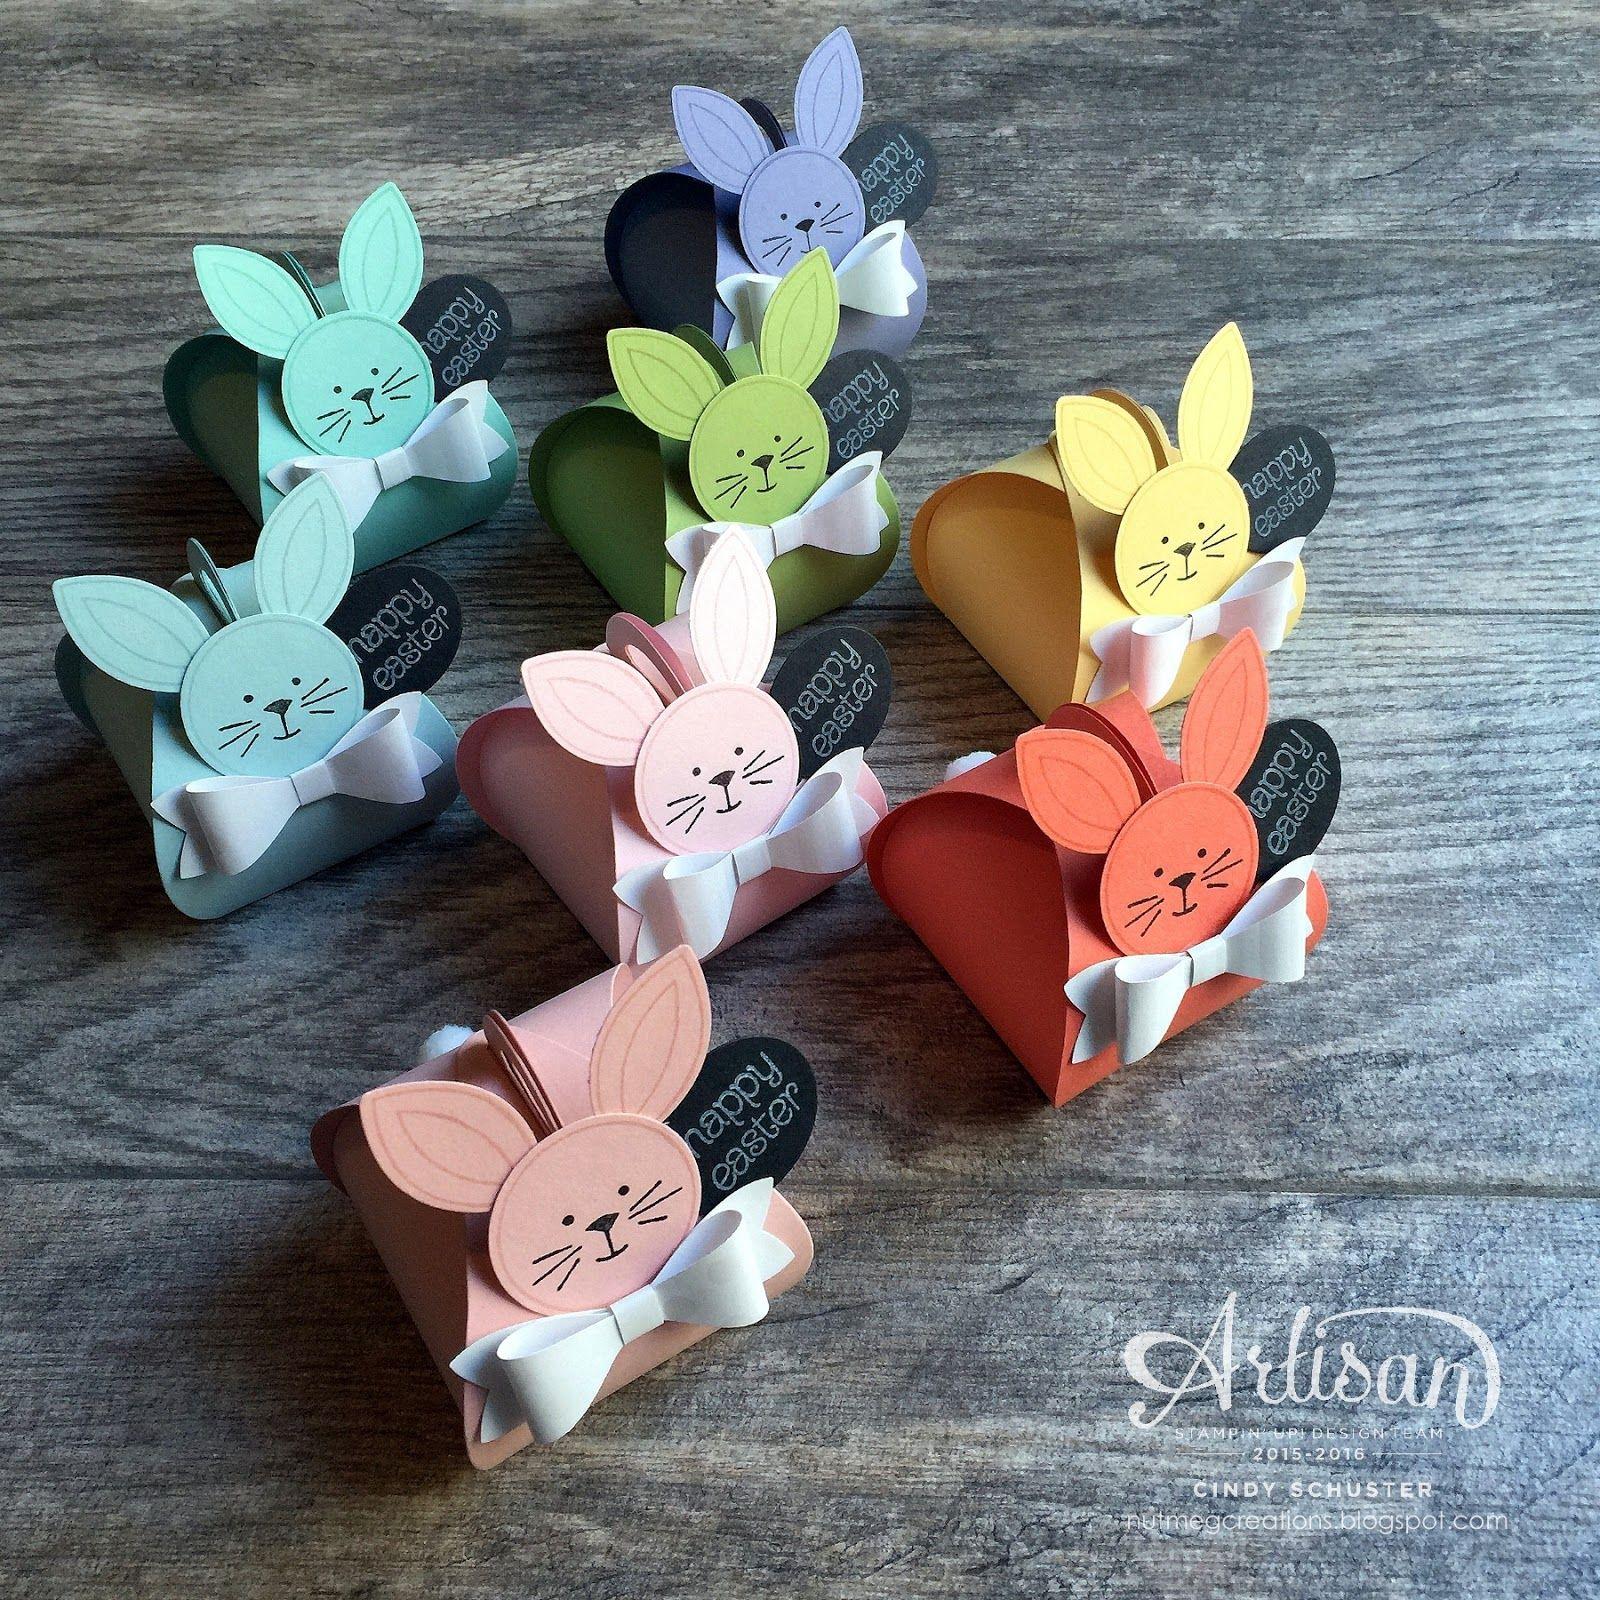 Fancy Friday – Spring Inspiration Bunnies!